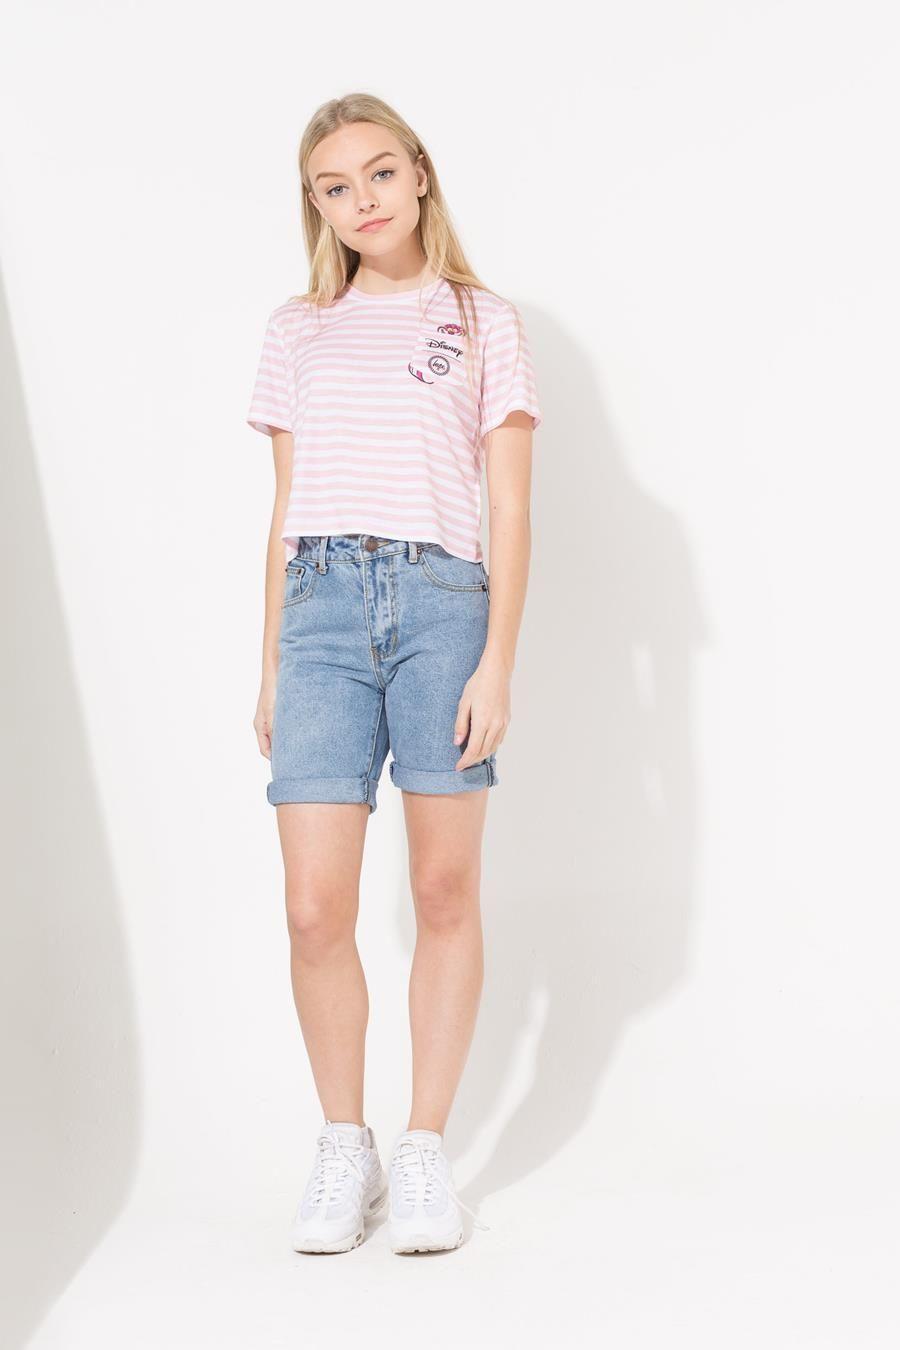 Hype Disney Pink Cheshire Cat Pocket Kids Crop T-Shirt